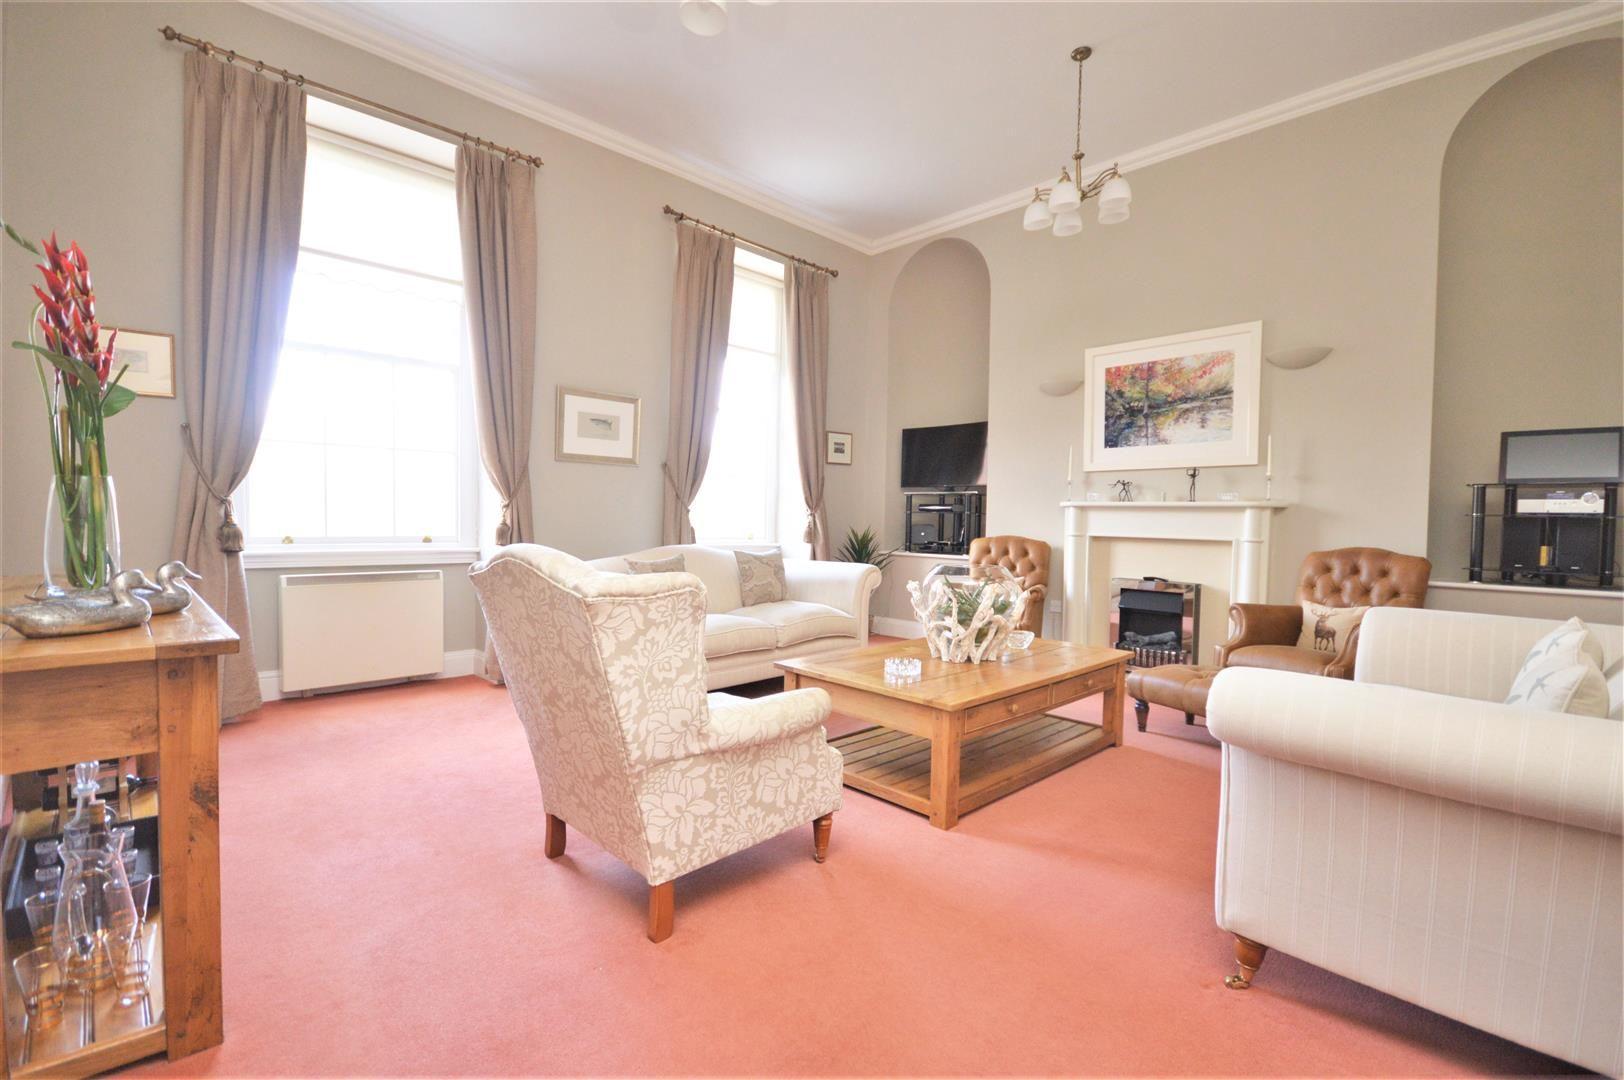 2 bed apartment for sale in Victoria Bridge 2